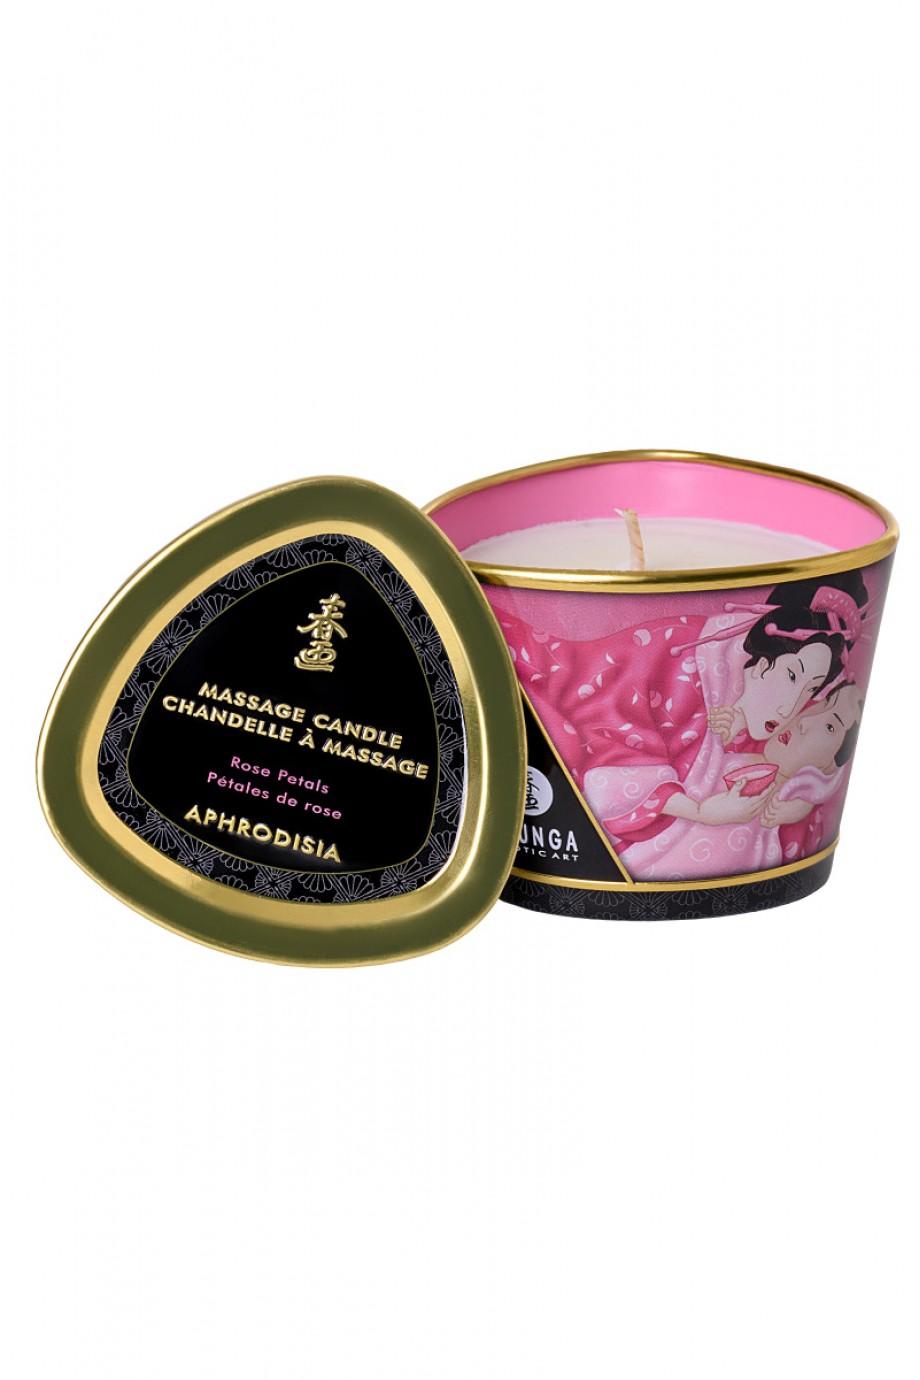 Массажное аромамасло Shunga Aphrodisia с ароматом розы, 170 мл